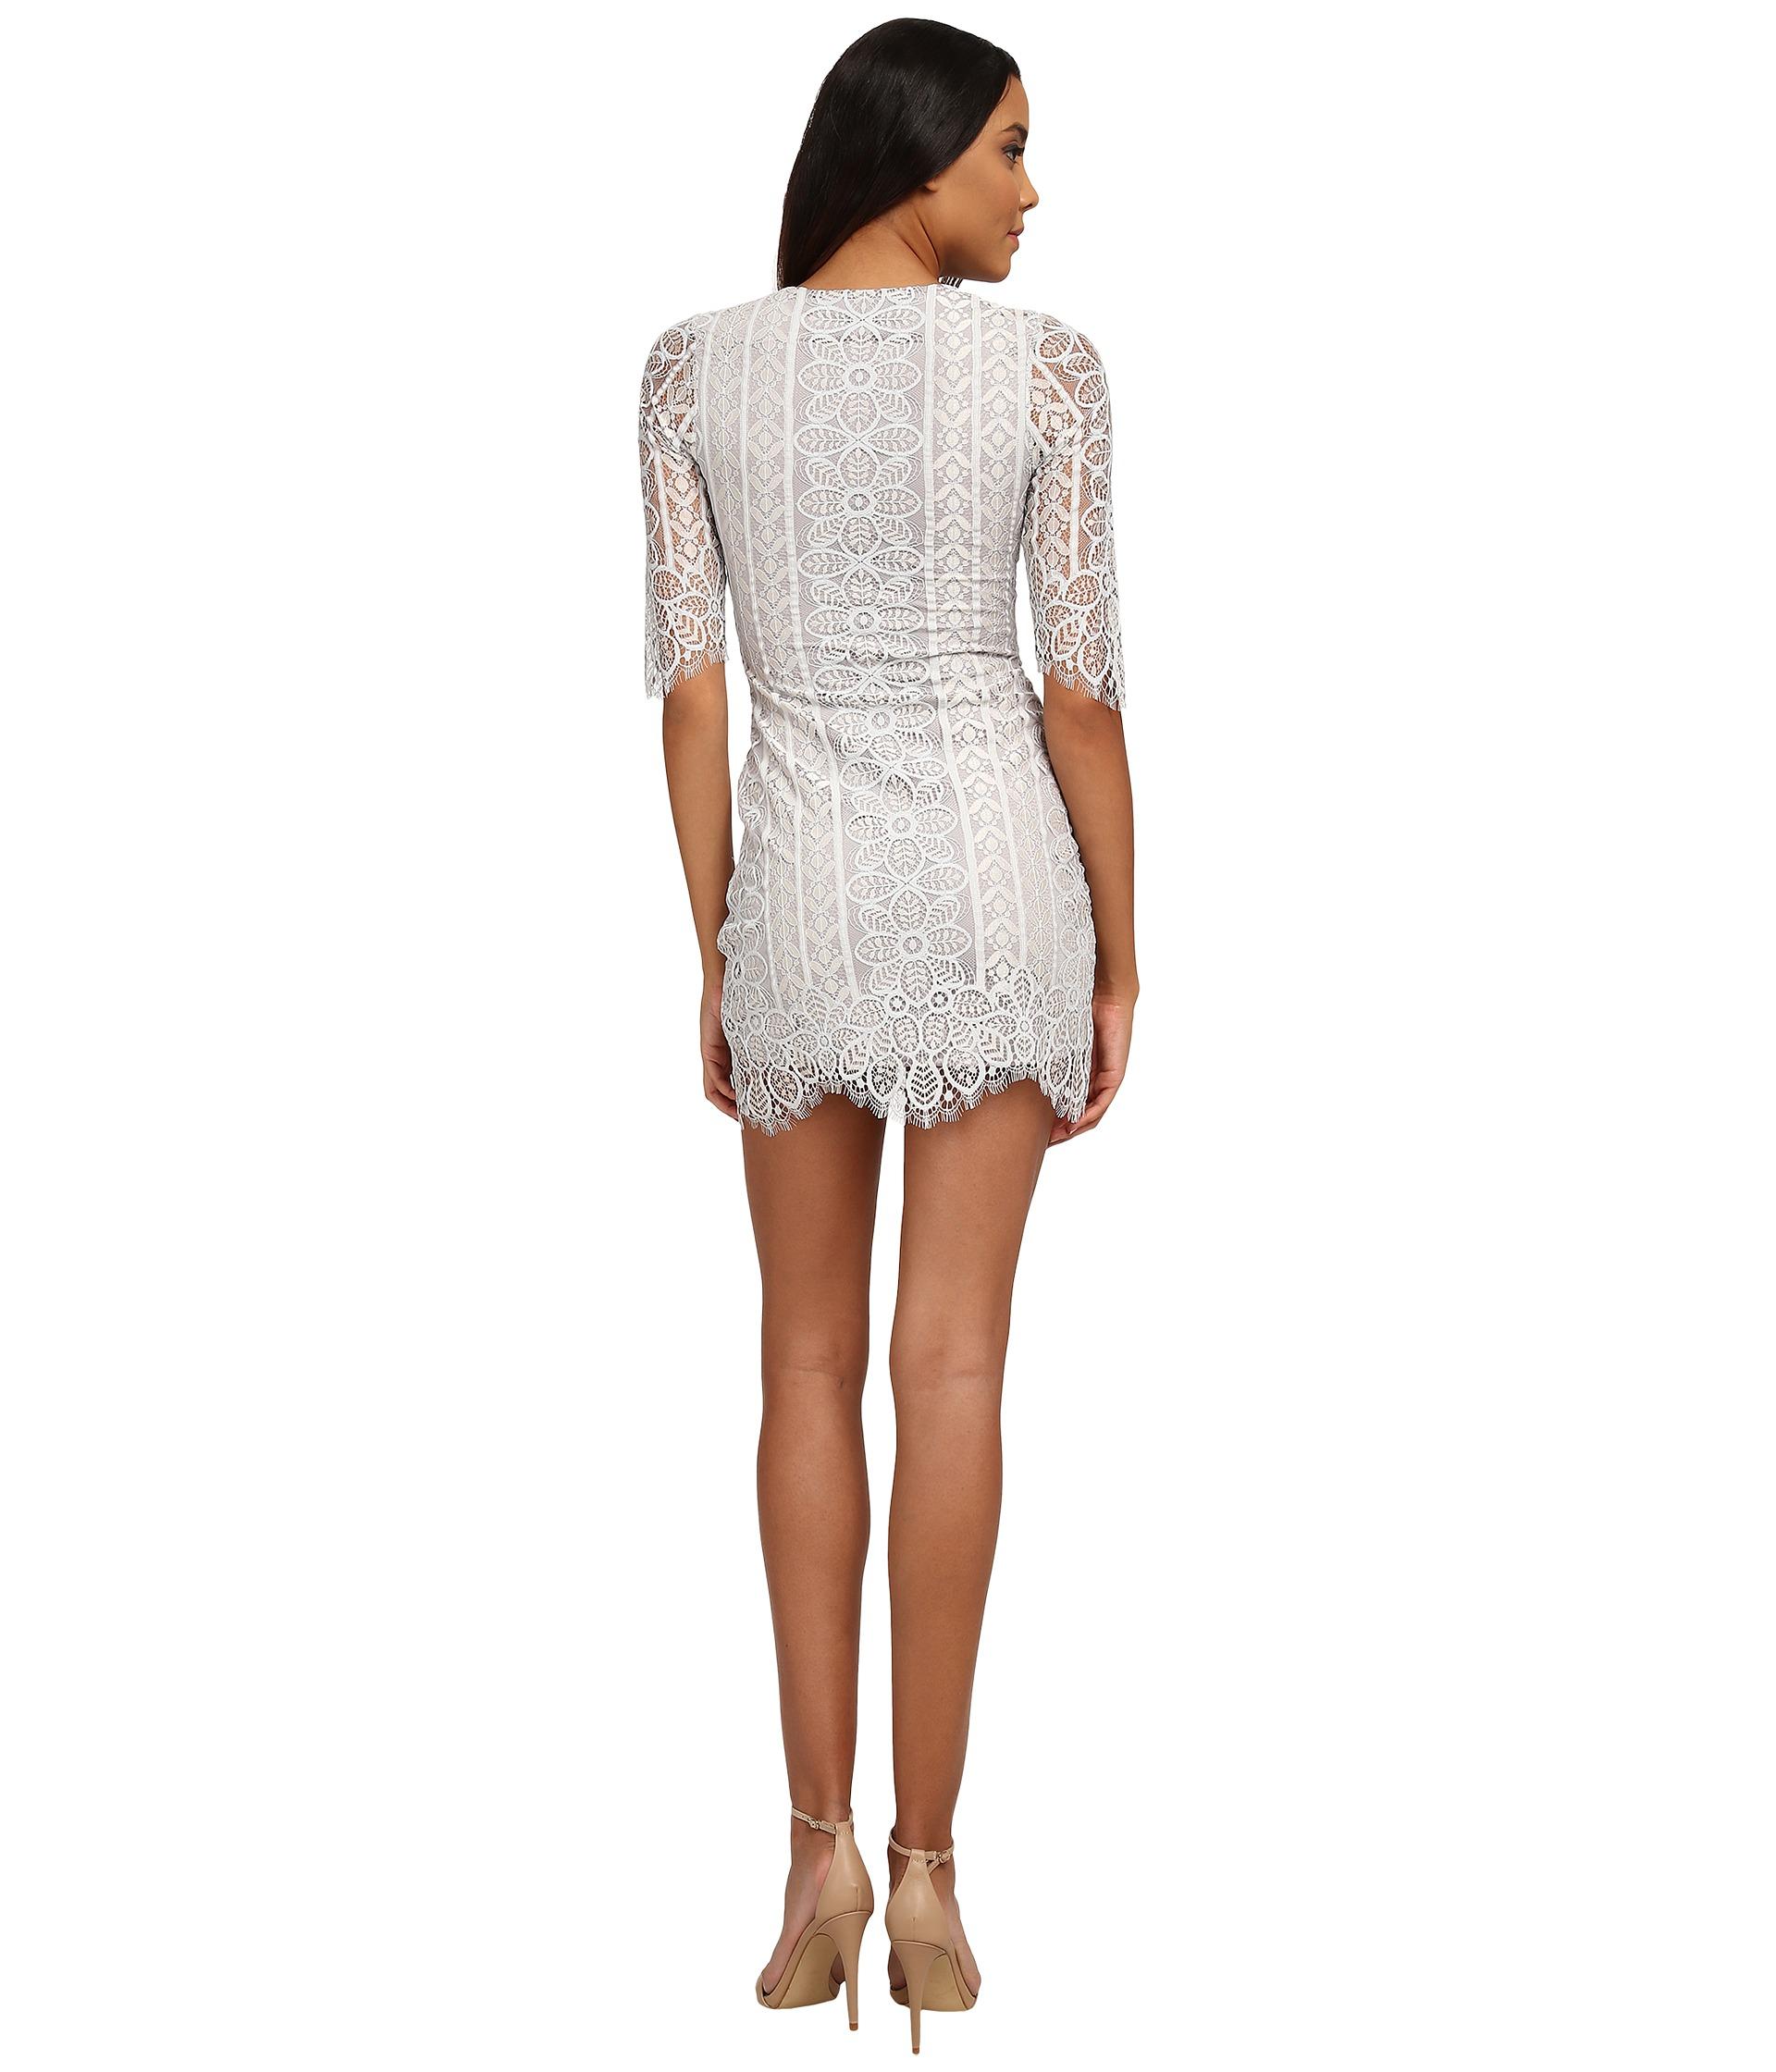 U Love Cocktail Dresses 17